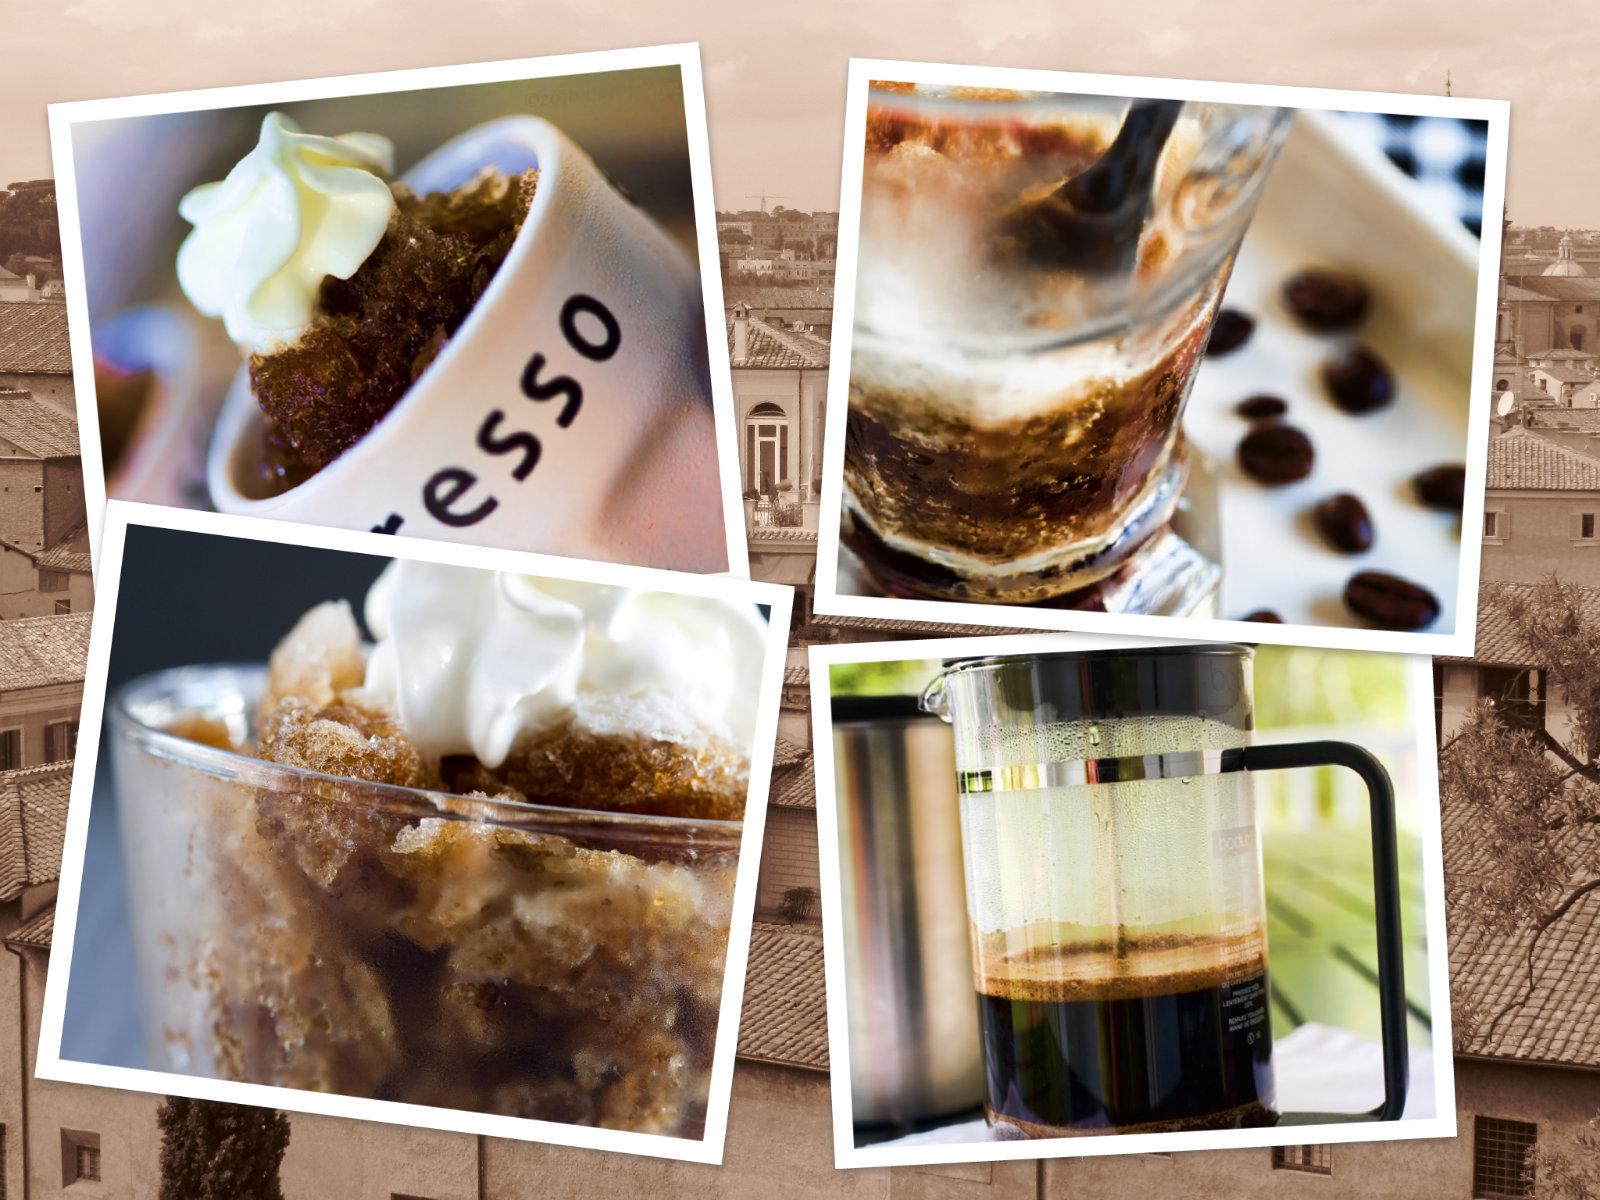 Anita S Cafe Edinburg Texas